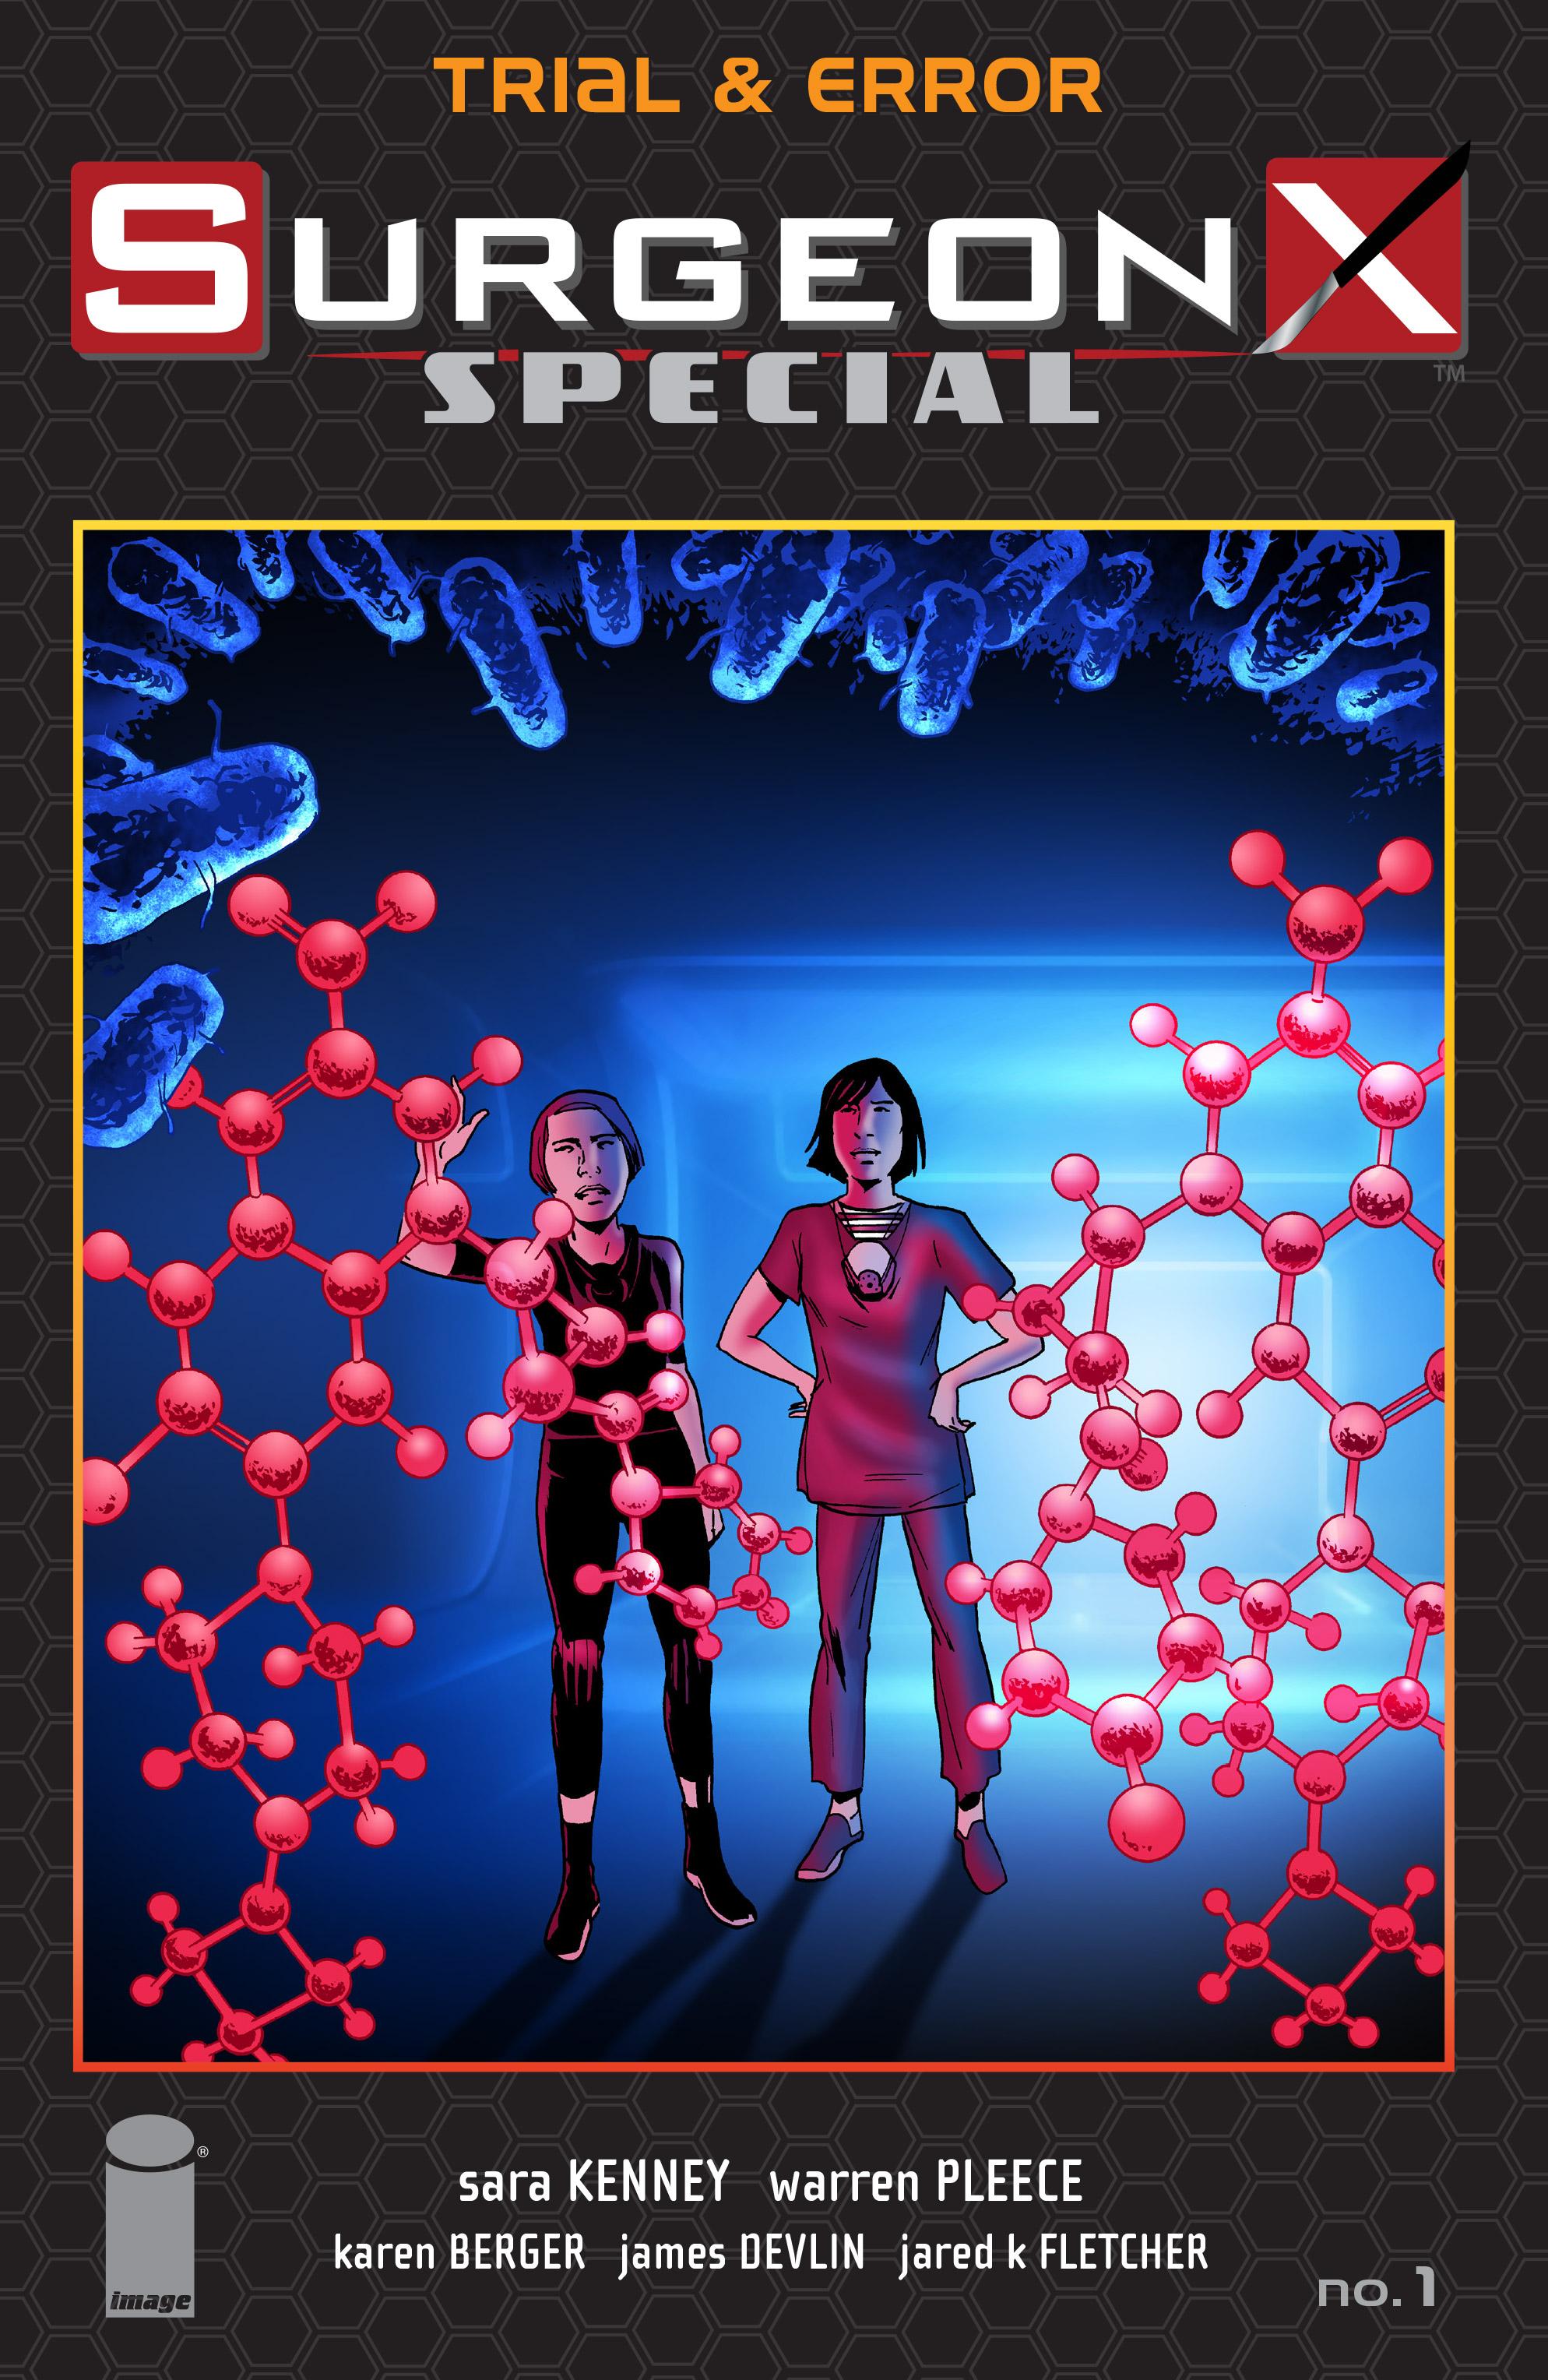 Read online Surgeon X Special: Trial & Error comic -  Issue # Full - 1